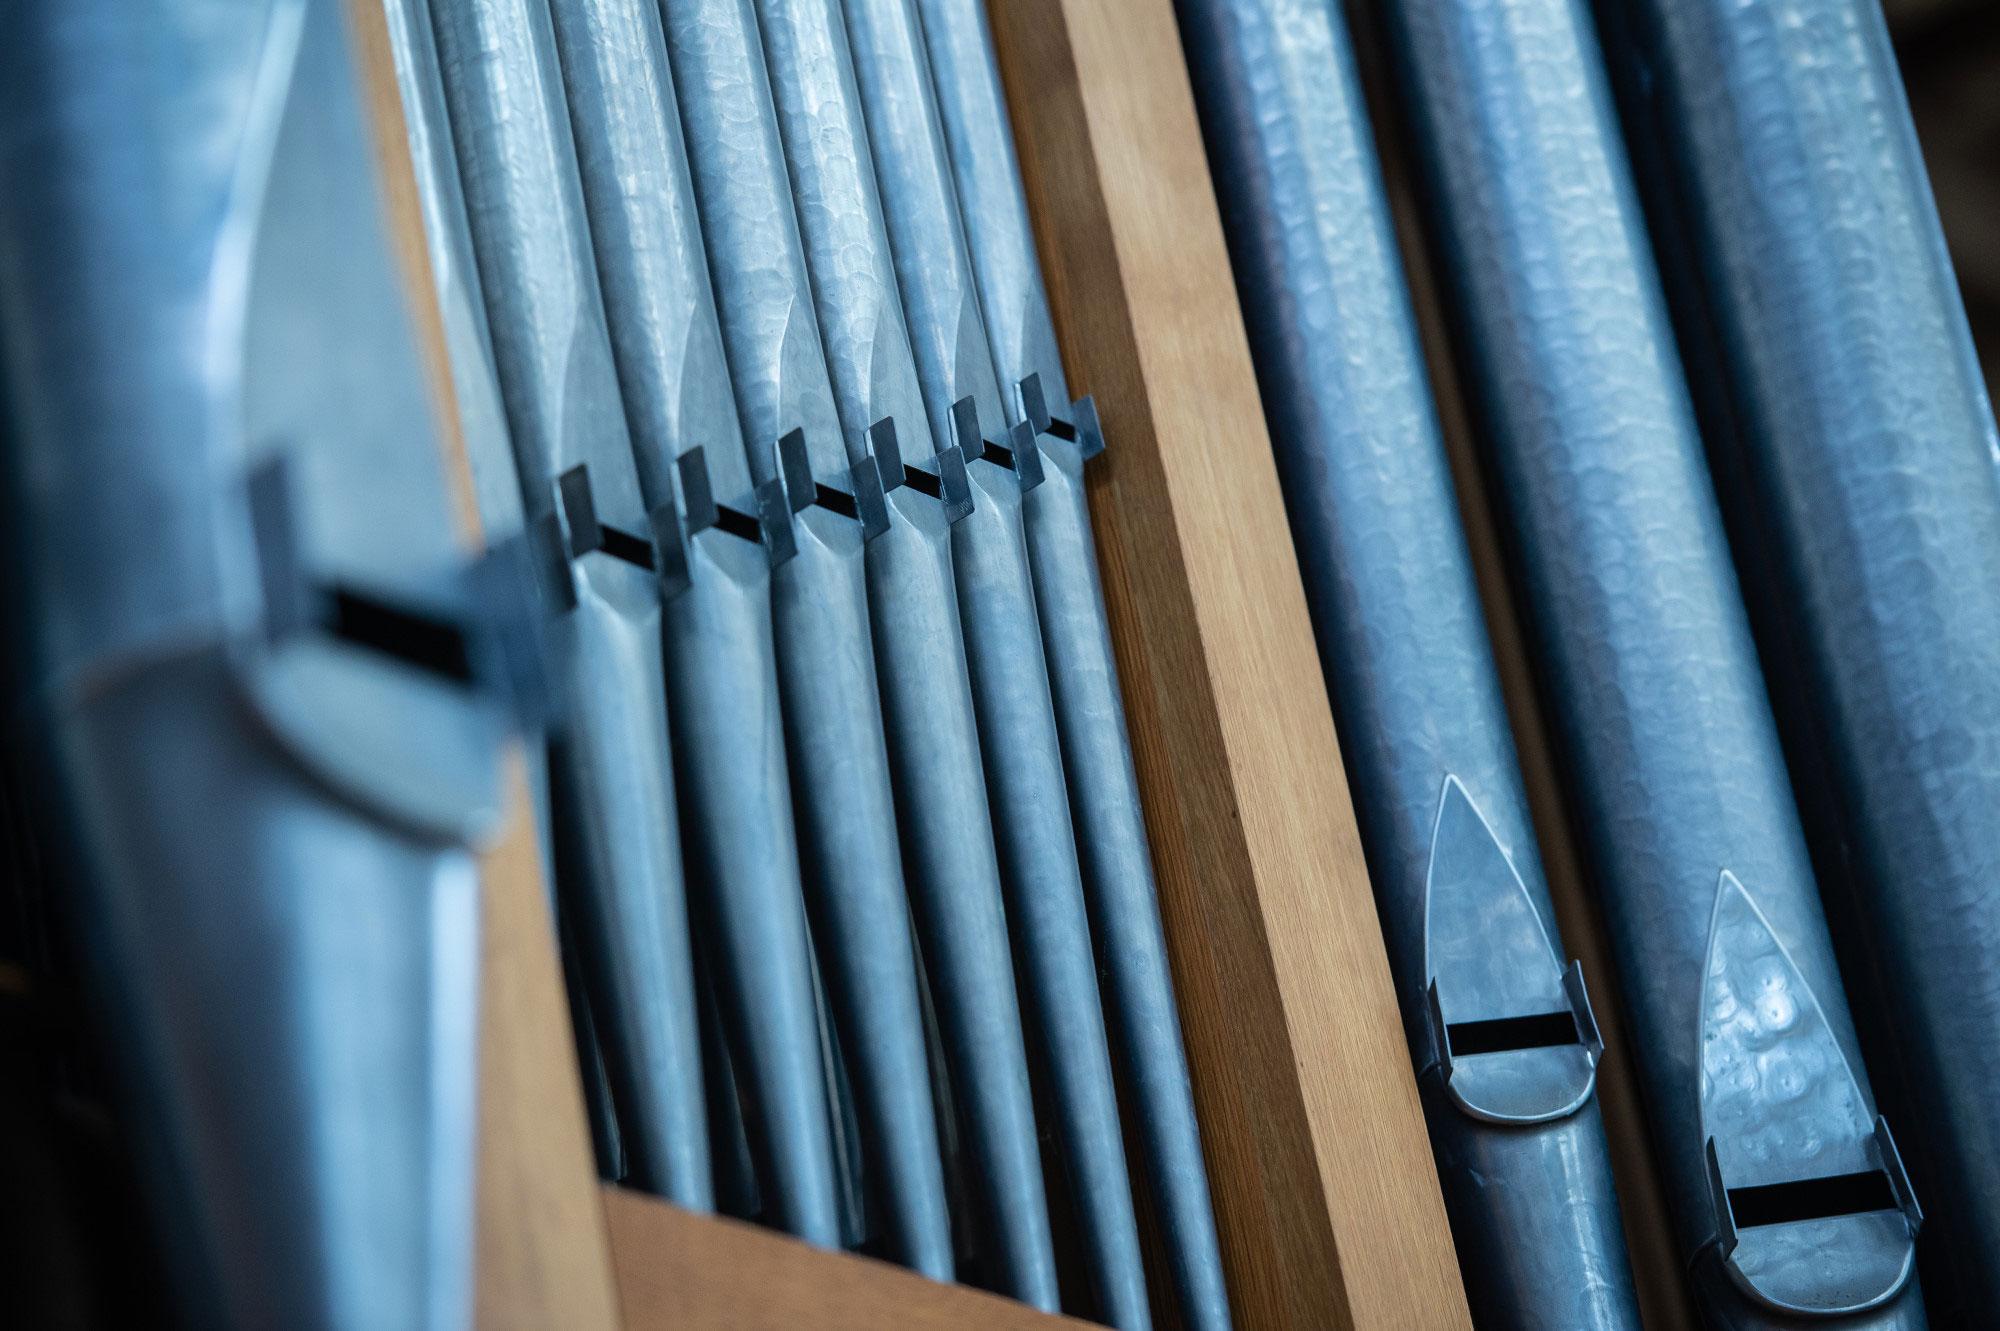 Forthinghay Church organ pipes